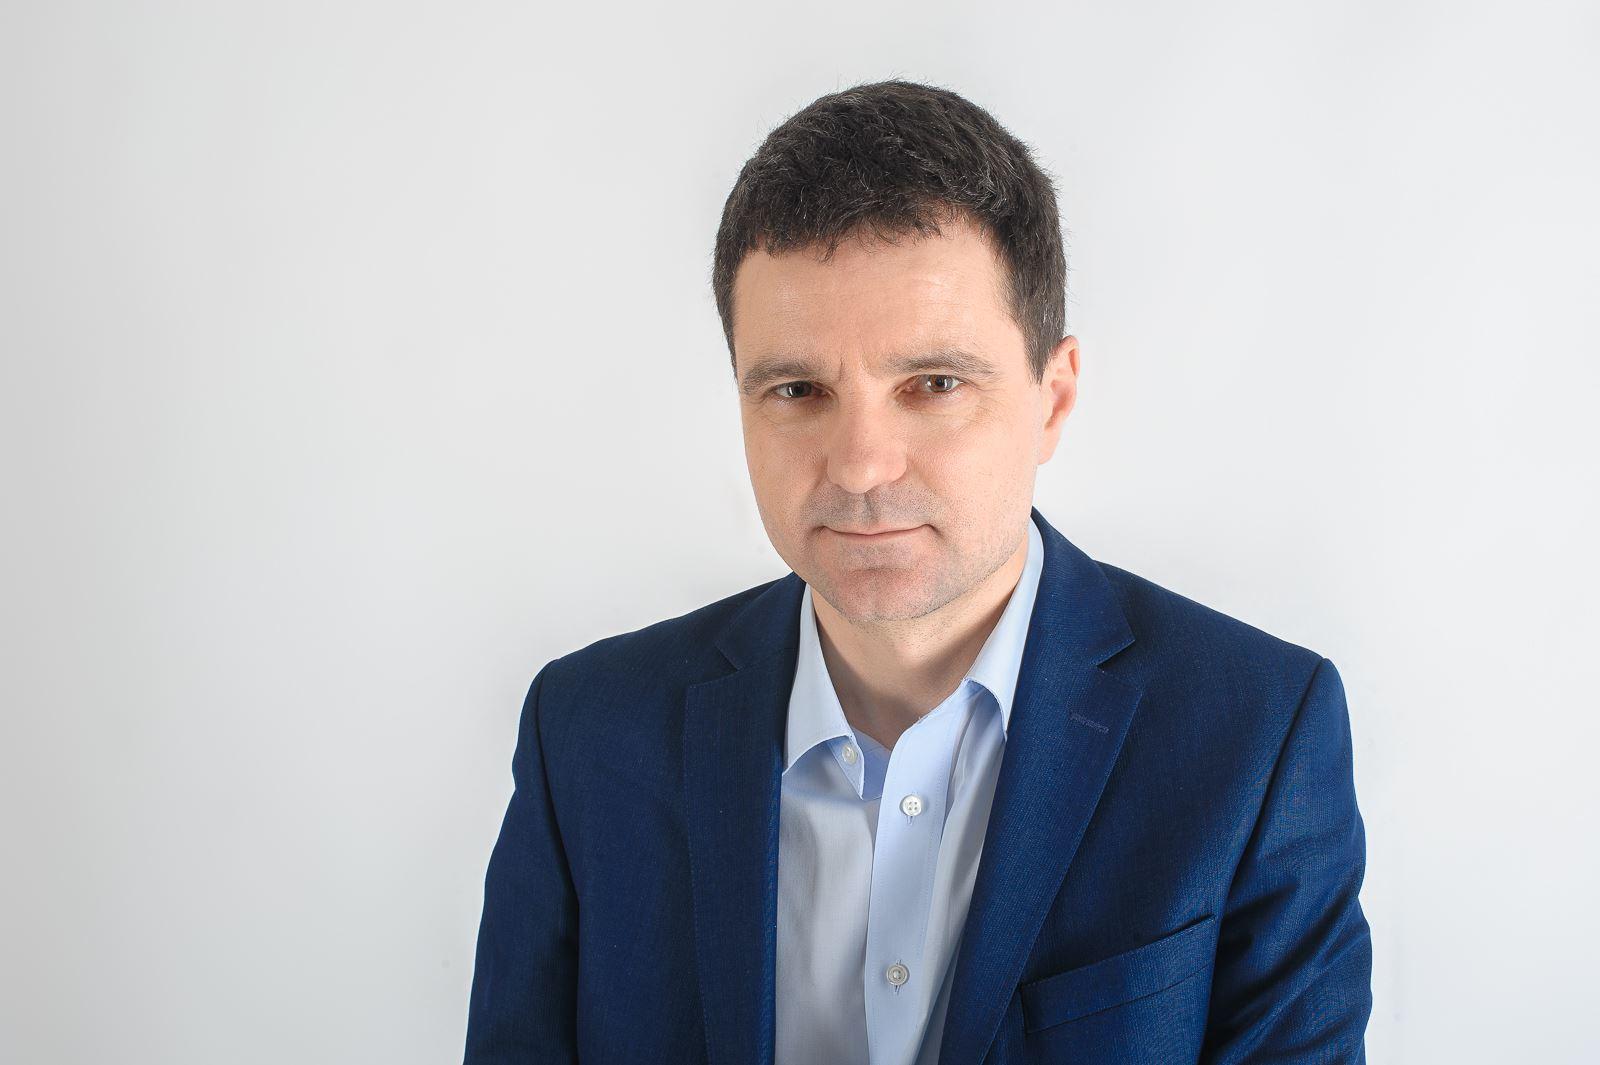 Președintele USR, Nicușor Dan, vine la Piatra Neamț și Roman